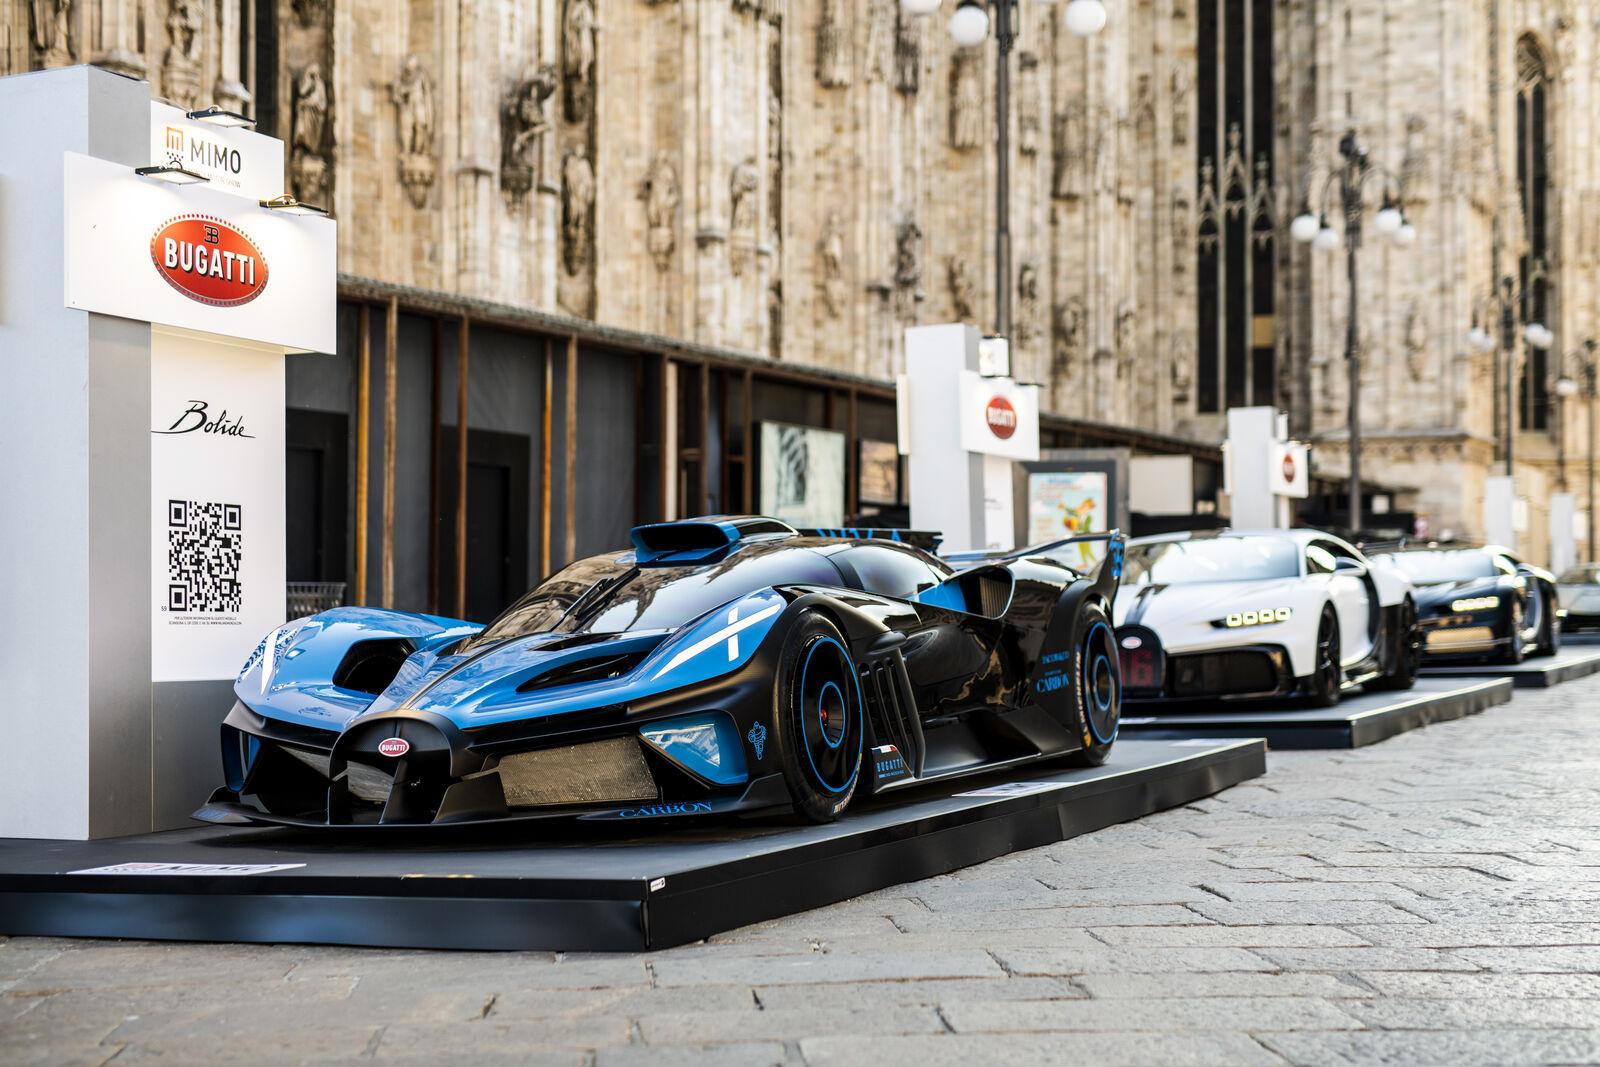 Bugatti Milan Monza (1).JPG